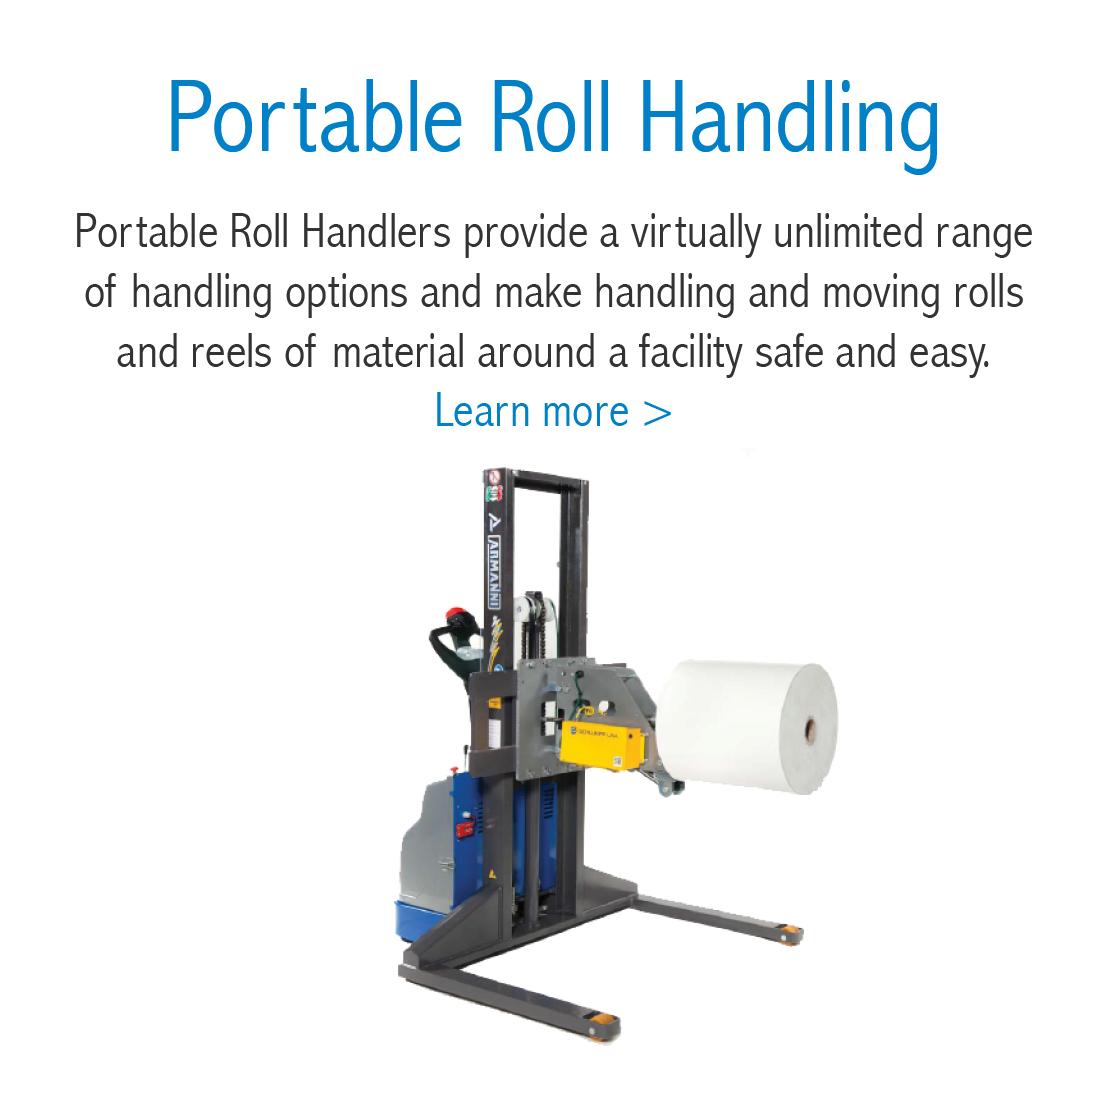 Portable Roll Handling